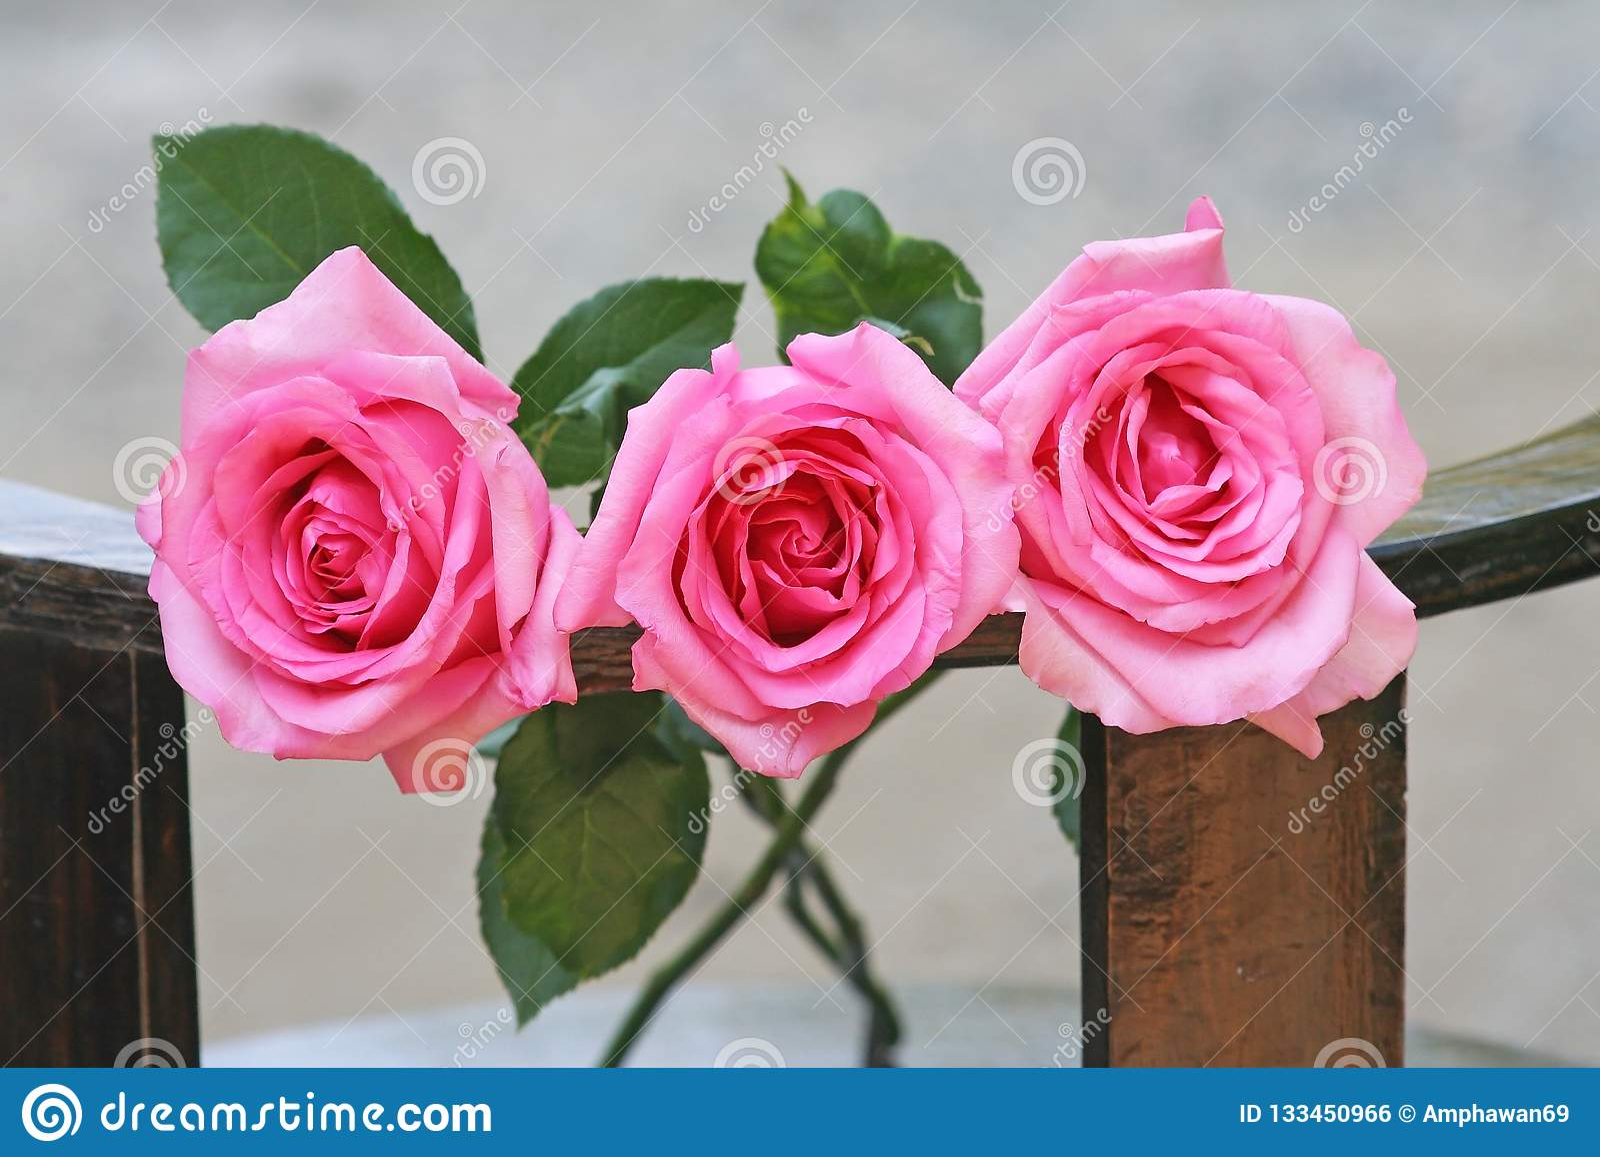 Drie roze rozenachtergrond